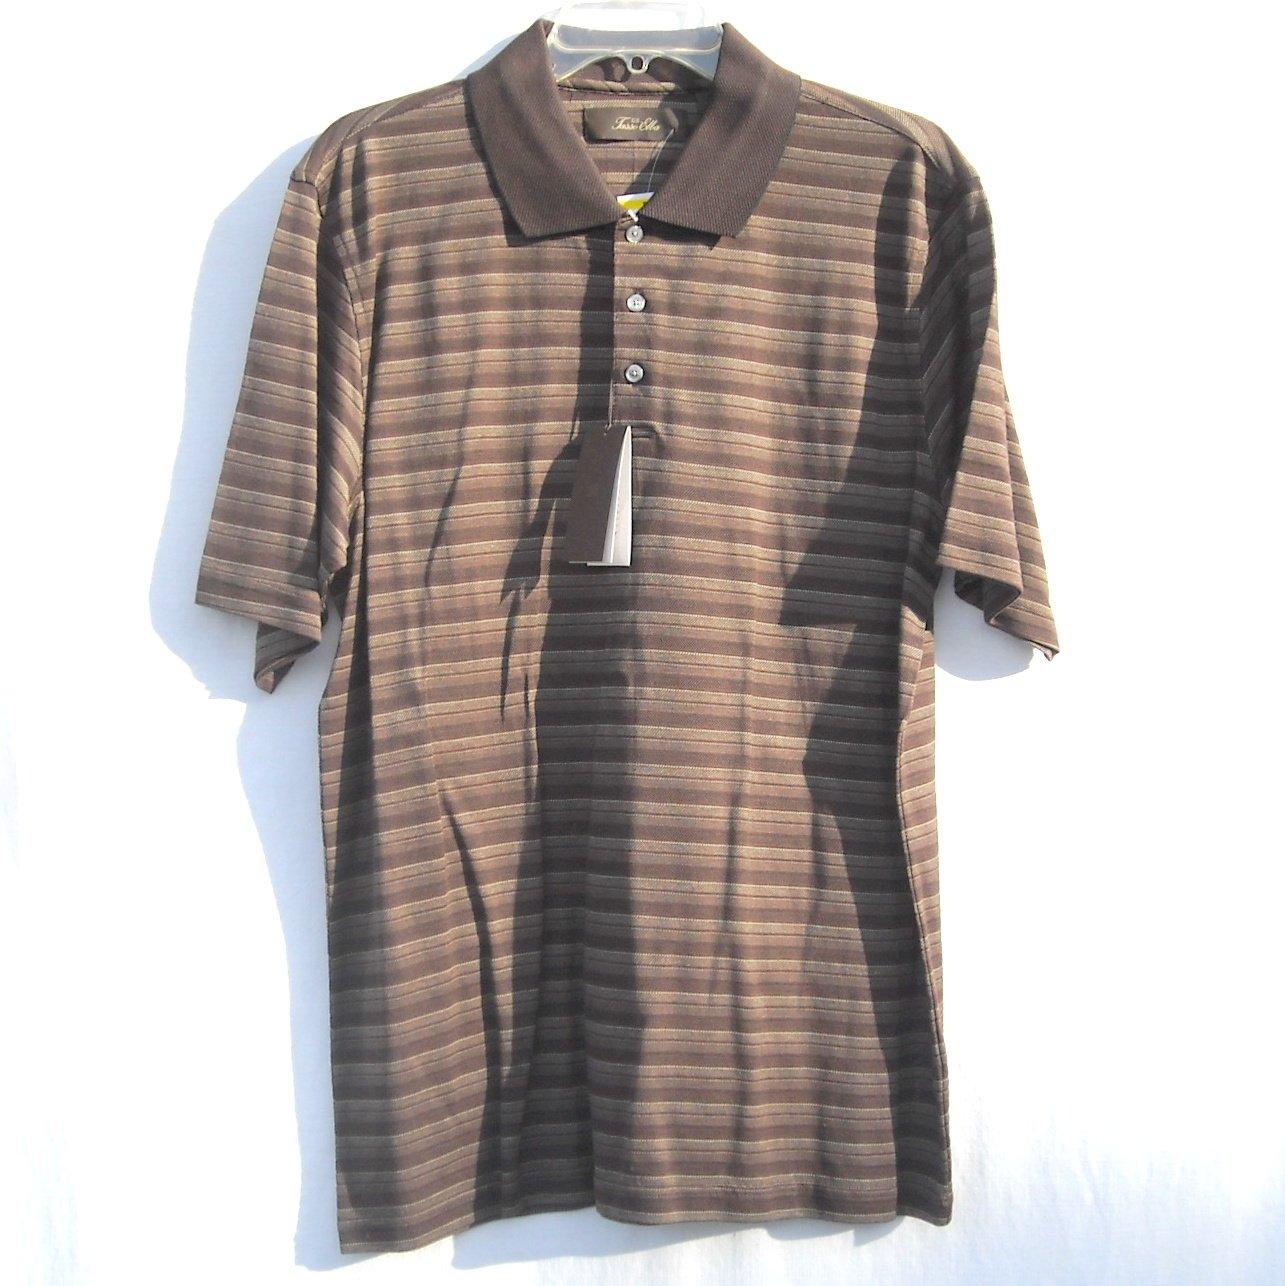 Tasso Elba Mens Short Sleeve 100% Cotton Striped Shirt Size M